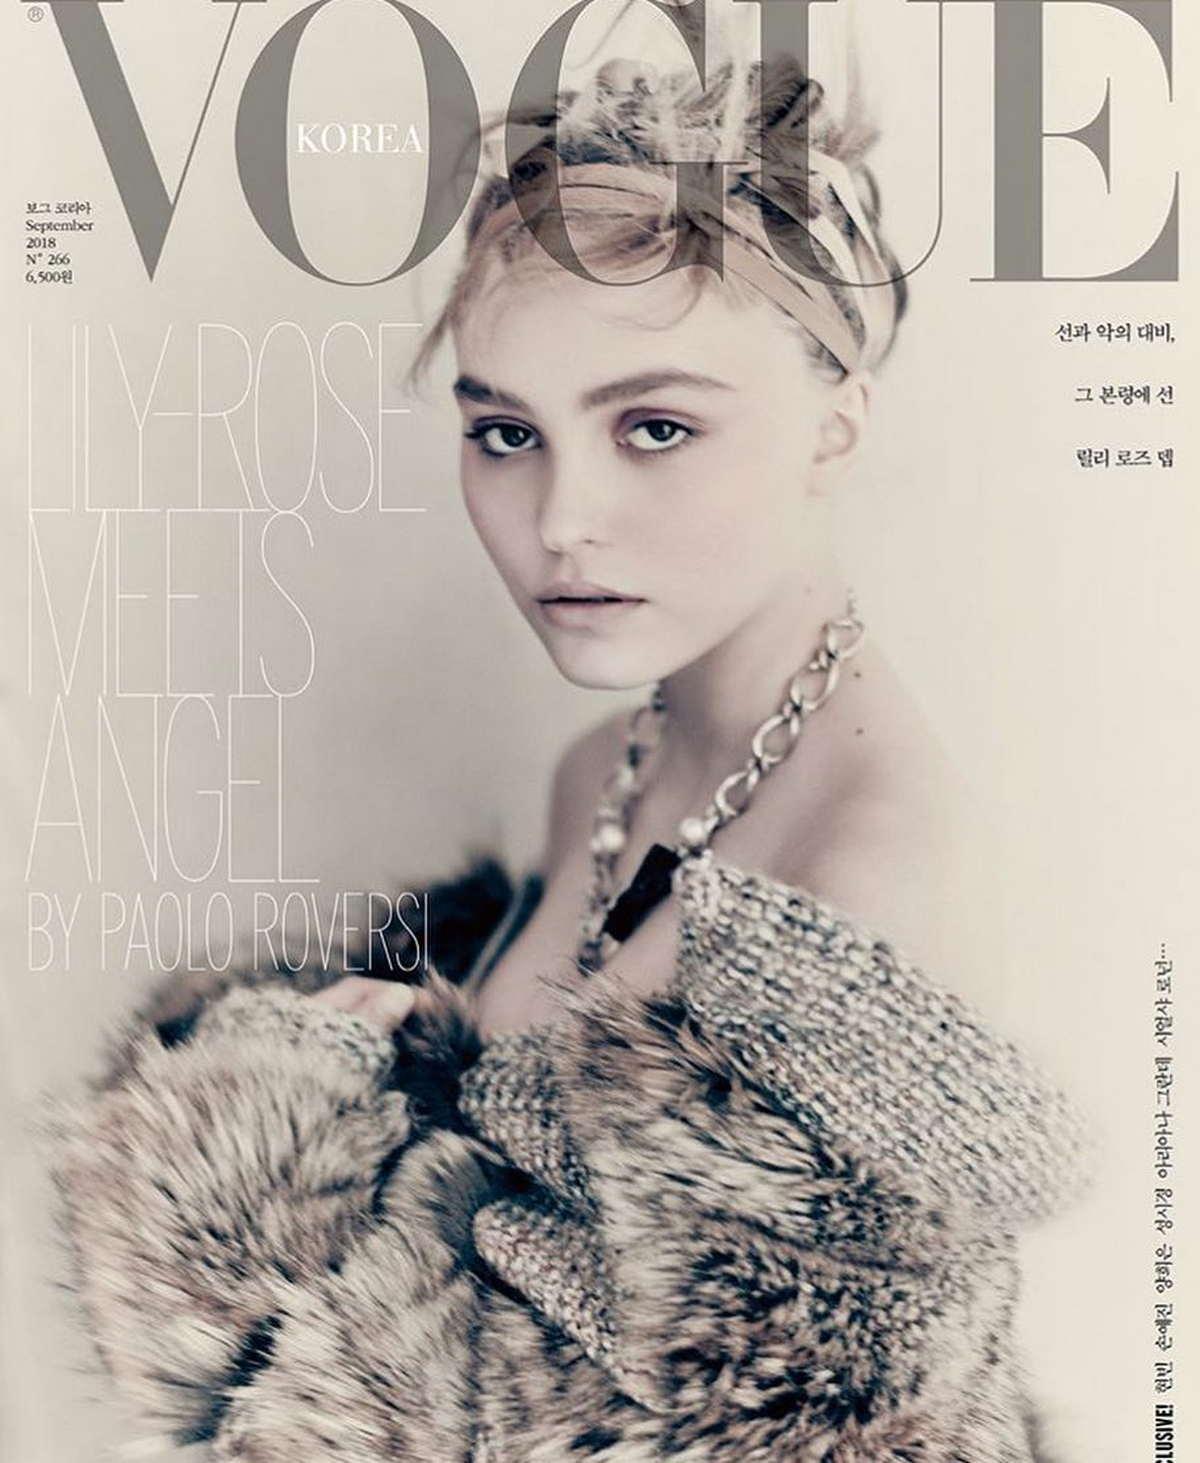 Lily-Rose-Depp-Vogue-Korea-September-201800001.jpg